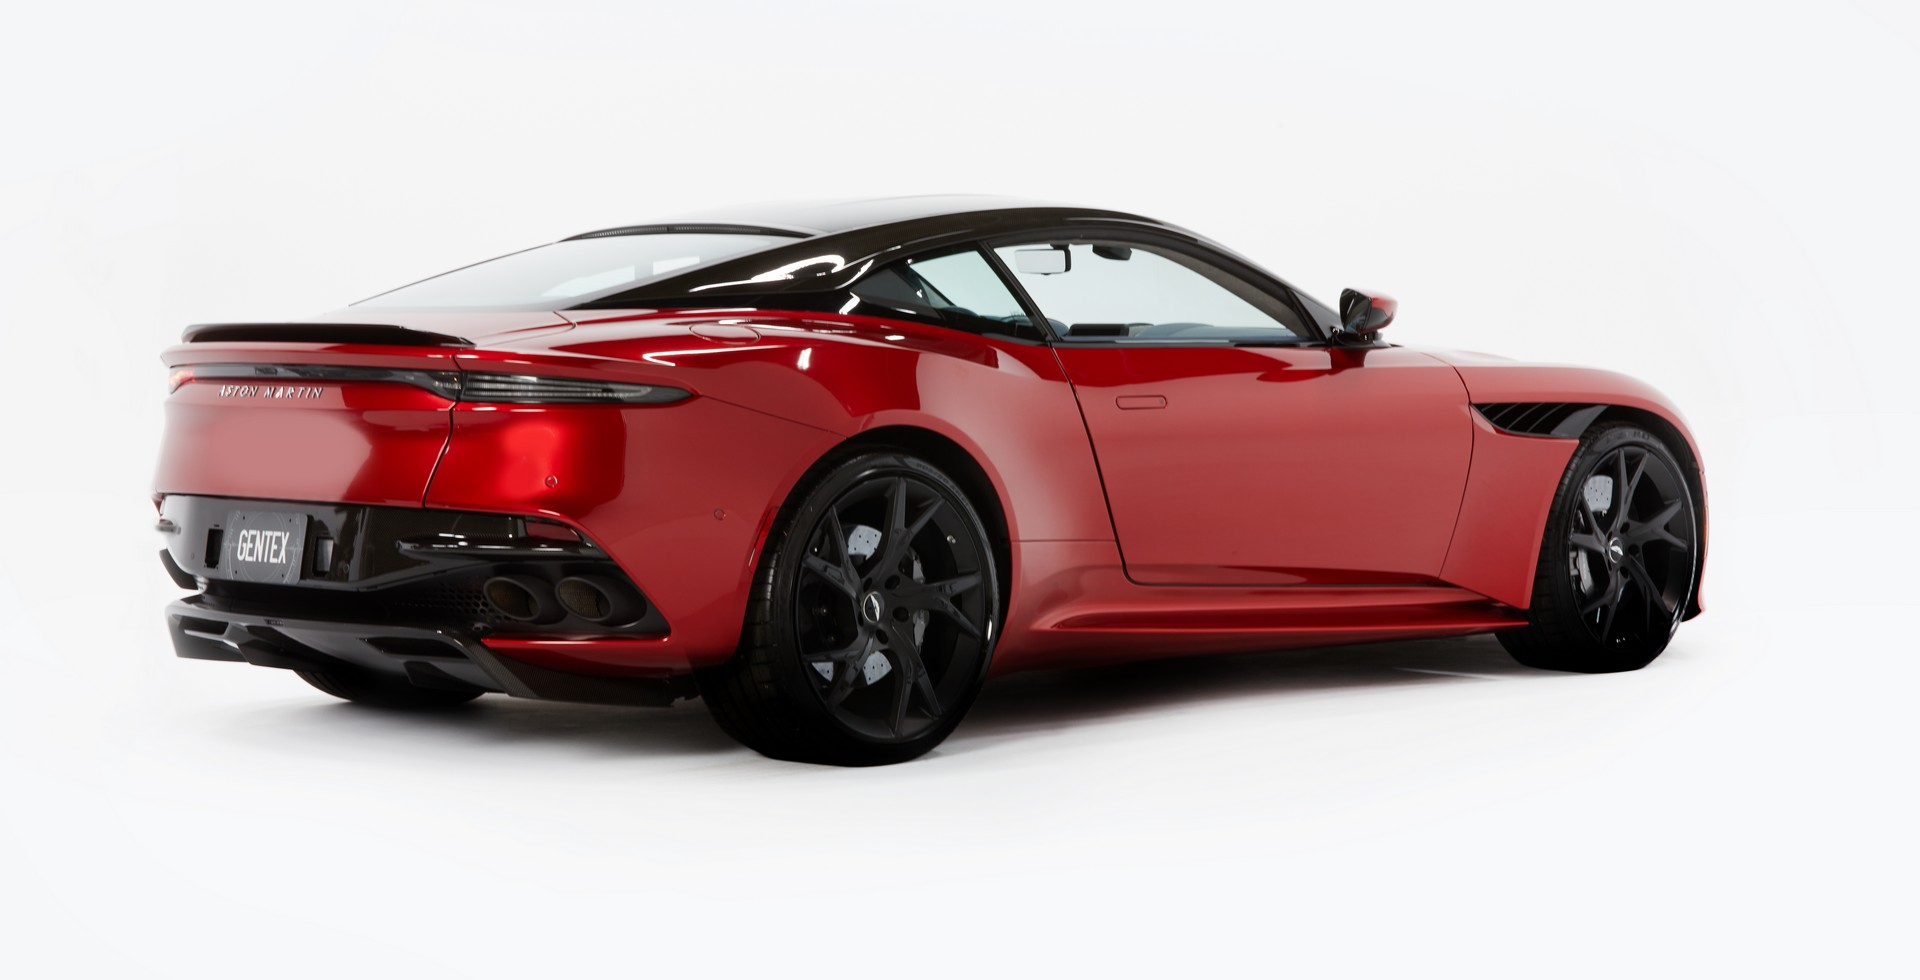 Aston-Martin-tri-camera-rearview-mirror-system-1